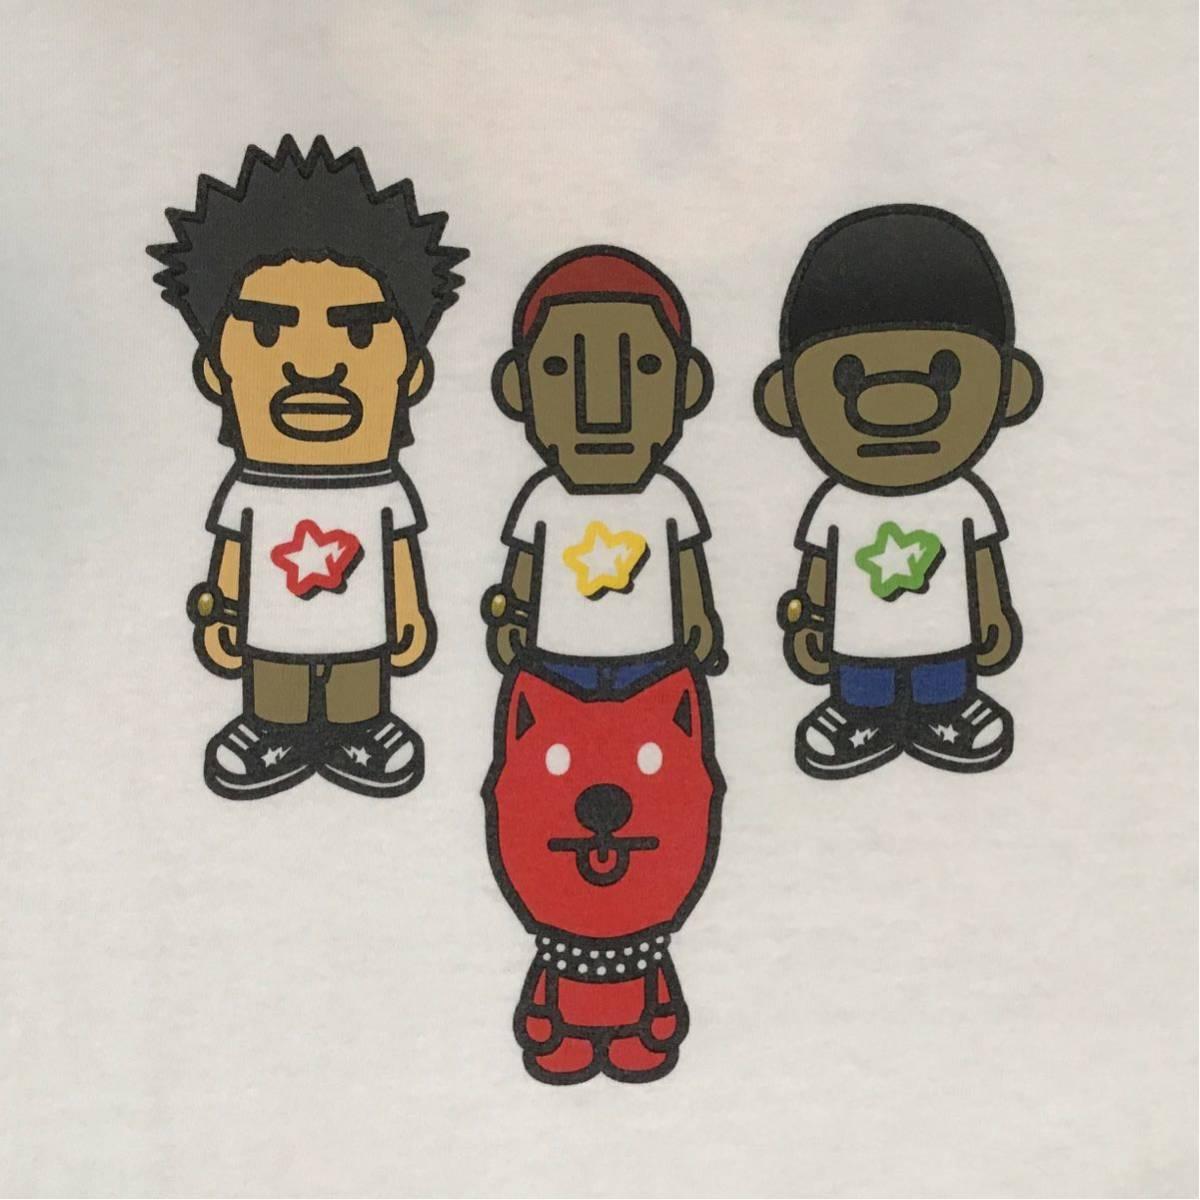 ★XL★ N.E.R.D × BAPE Tシャツ a bathing ape NERD pharrell THE NEPTUNES star trak エイプ ベイプ アベイシングエイプ NIGO 85m